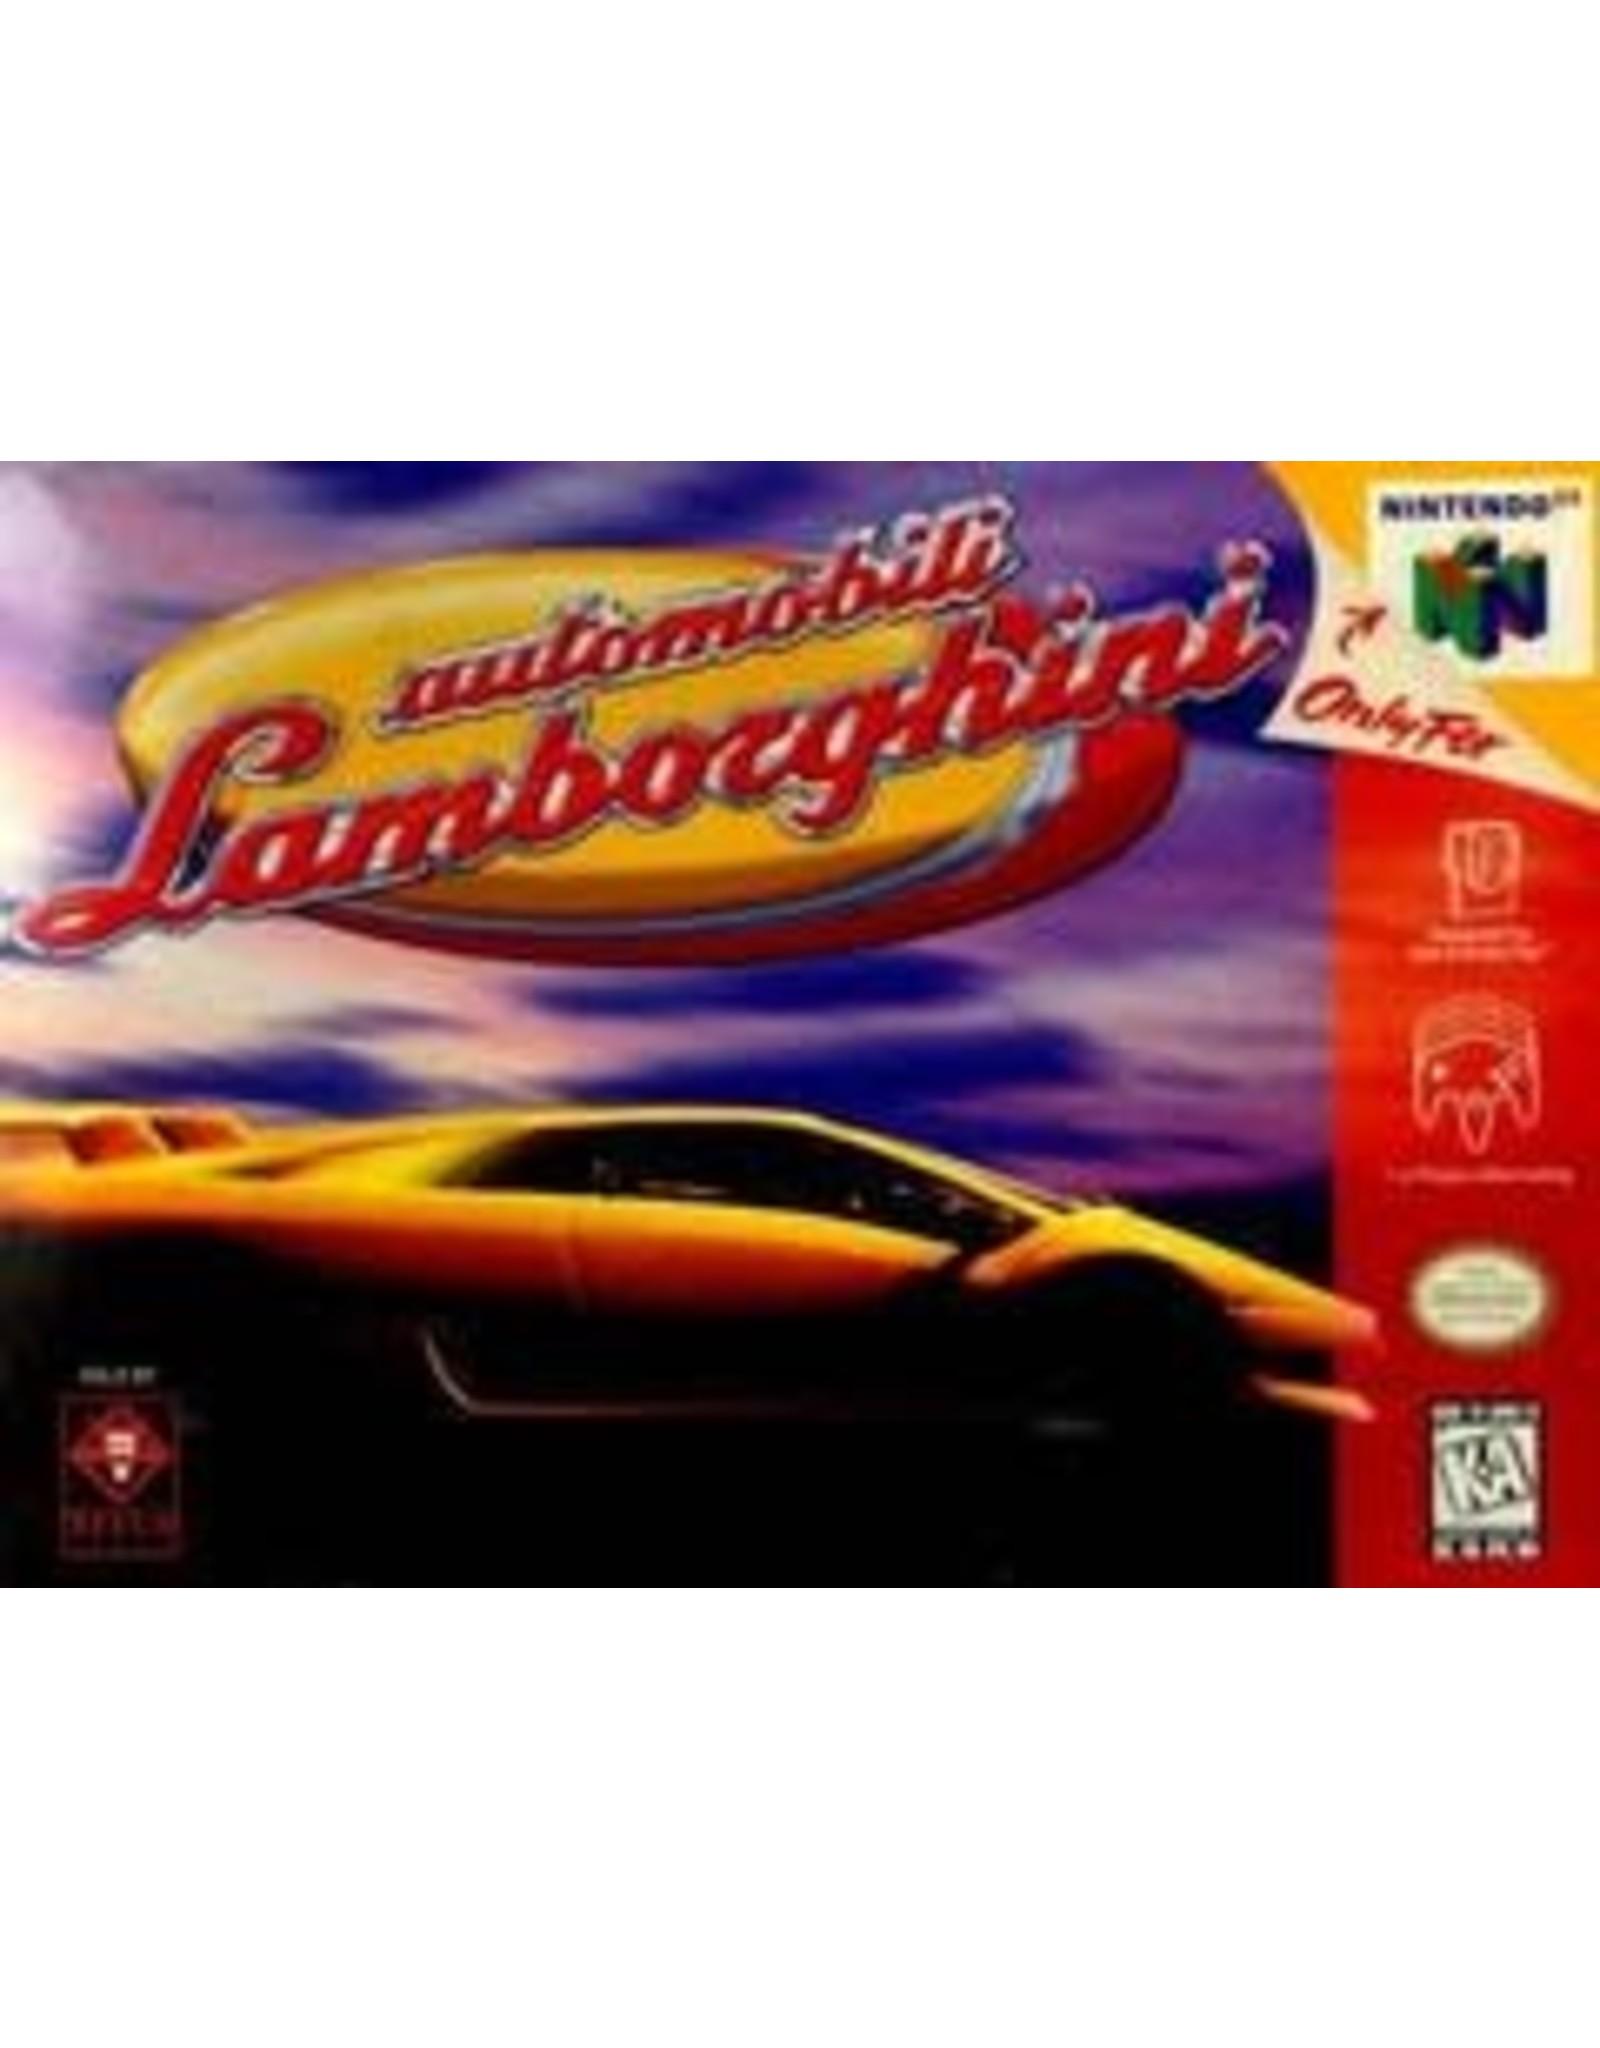 Nintendo 64 Automobili Lamborghini (Cart Only)